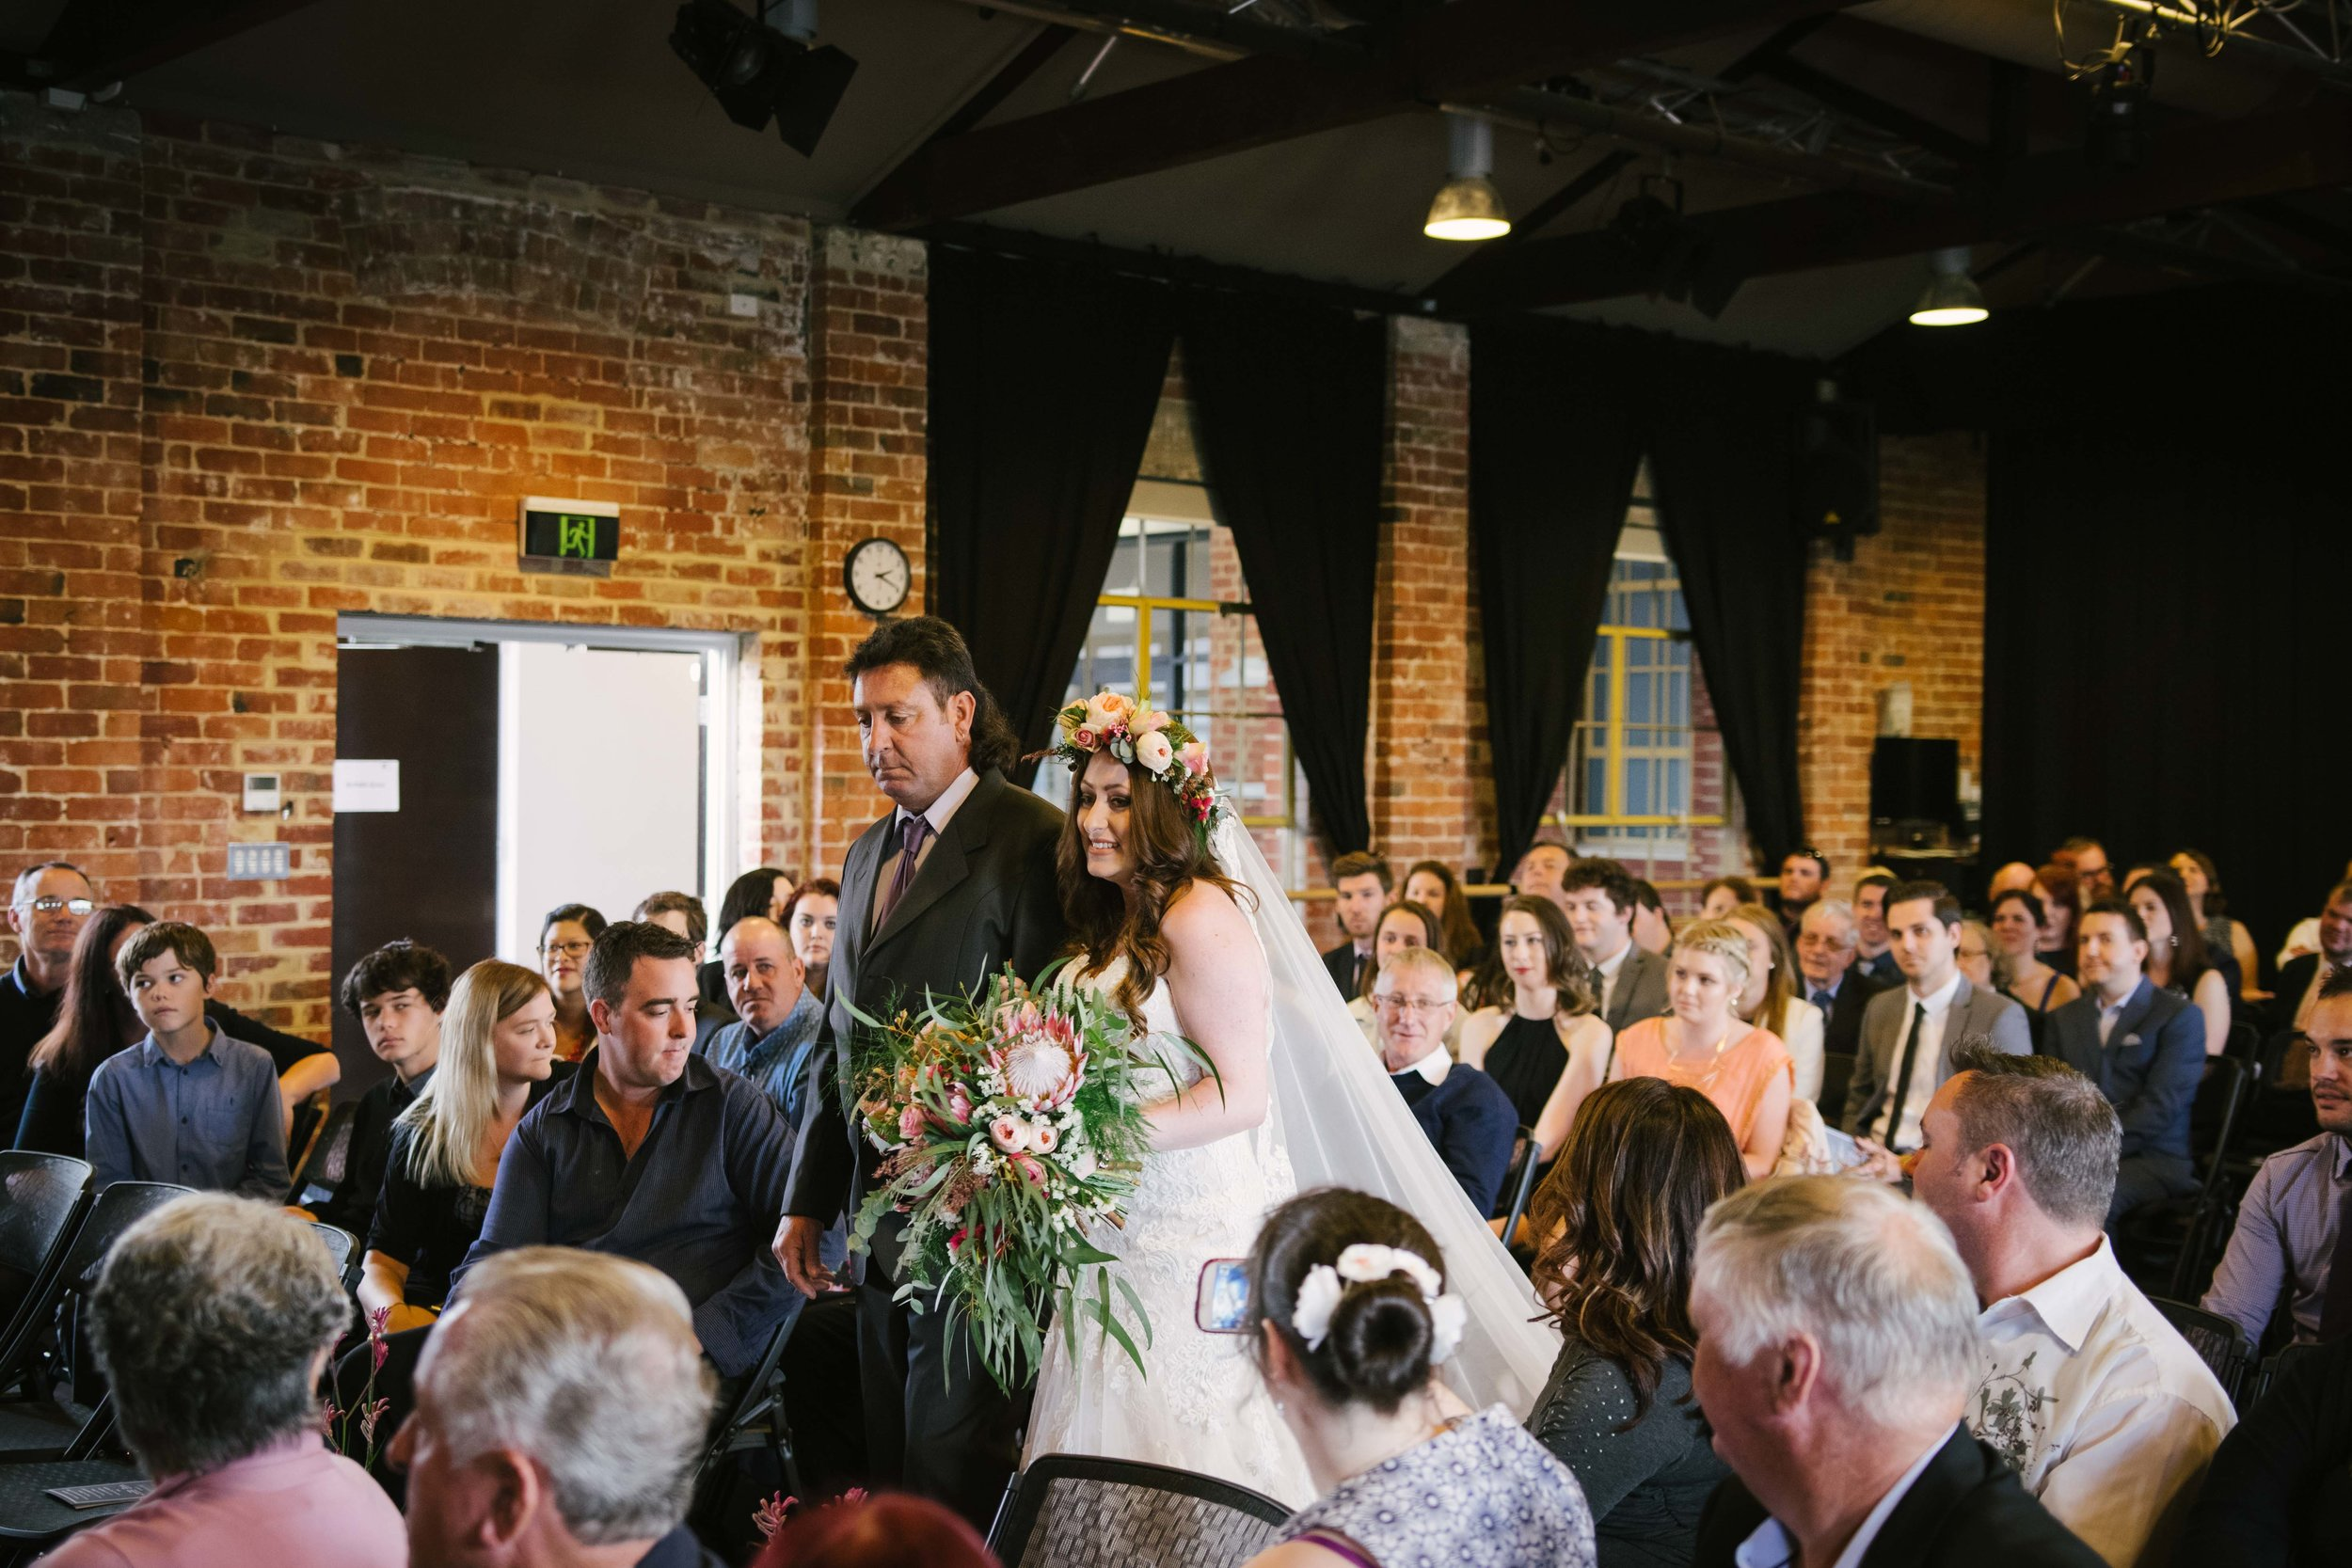 WA Ballet Centre Swan Valley Oakover Grounds Perth Wheatbelt Avon Valley Wedding Photographer (17).jpg